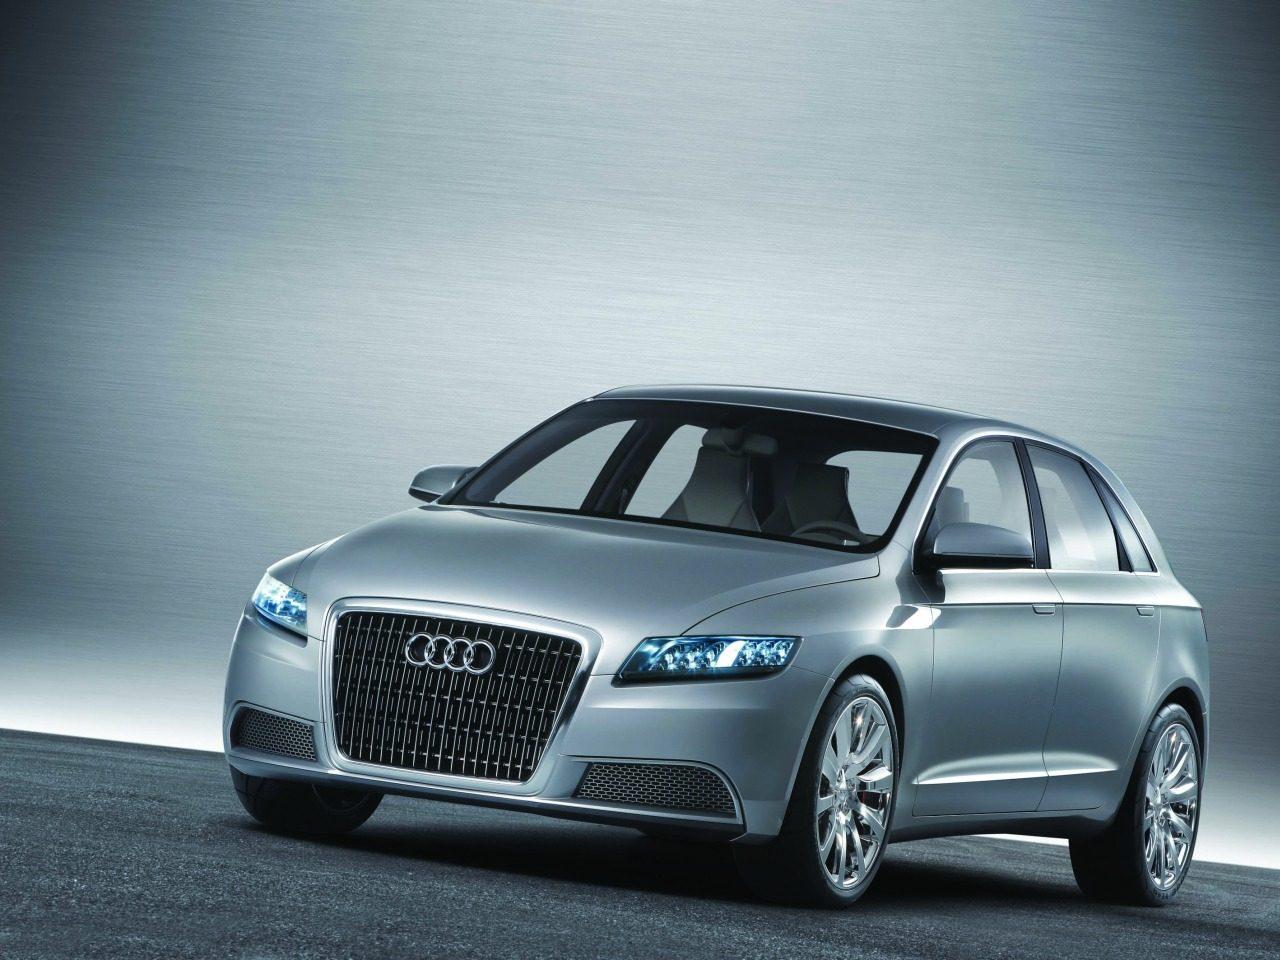 Audi_Roadjet_Concept_01.jpg